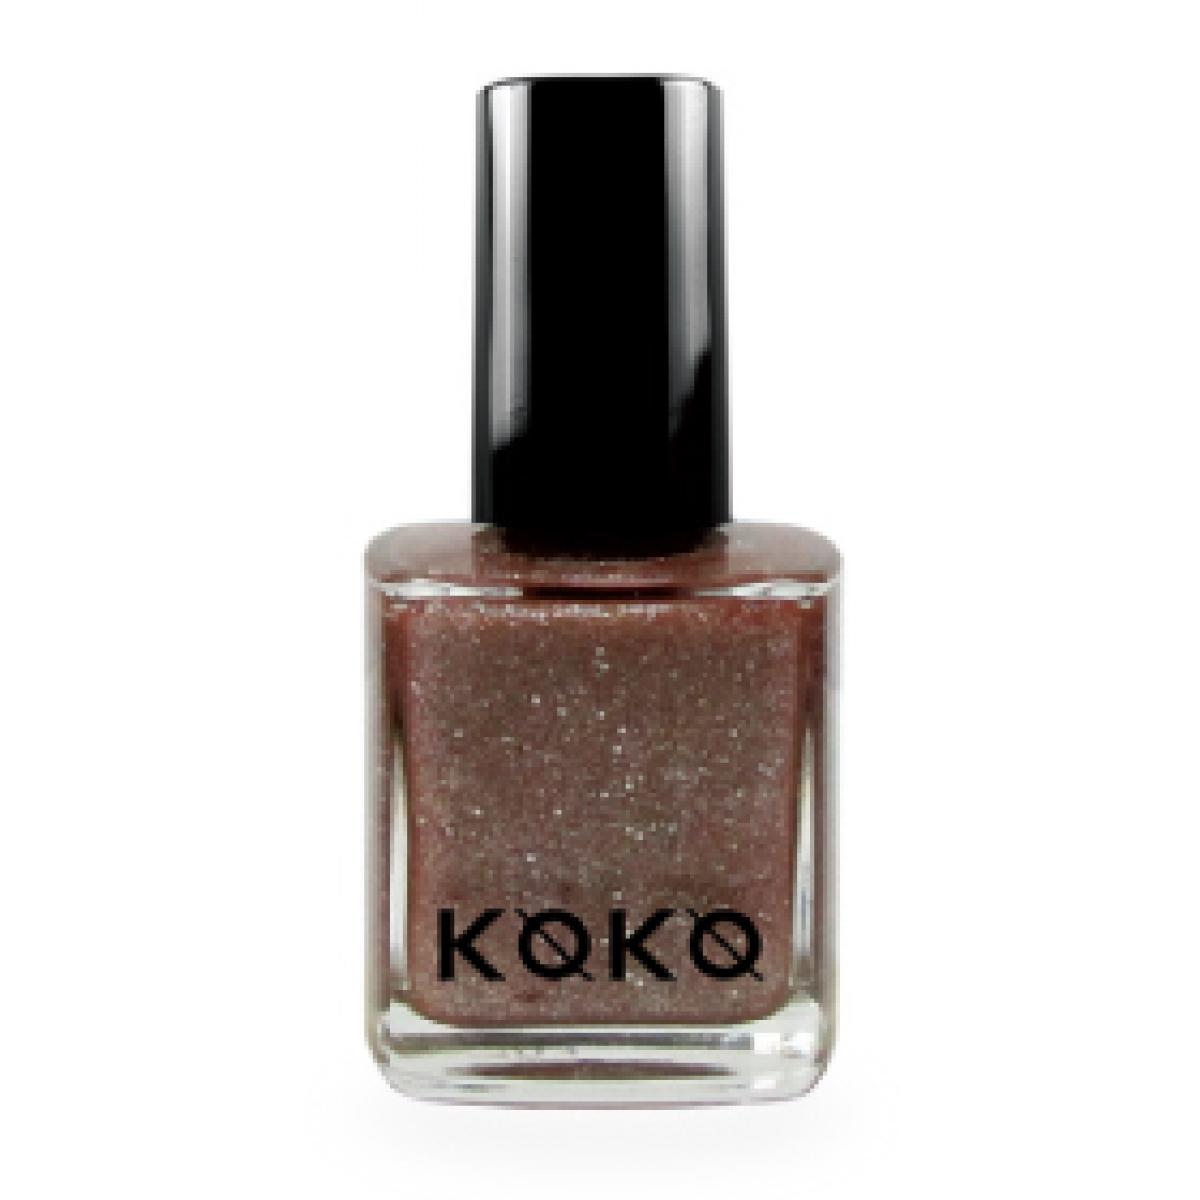 Rose Gold Koko Oje 342 Solid As A Rock